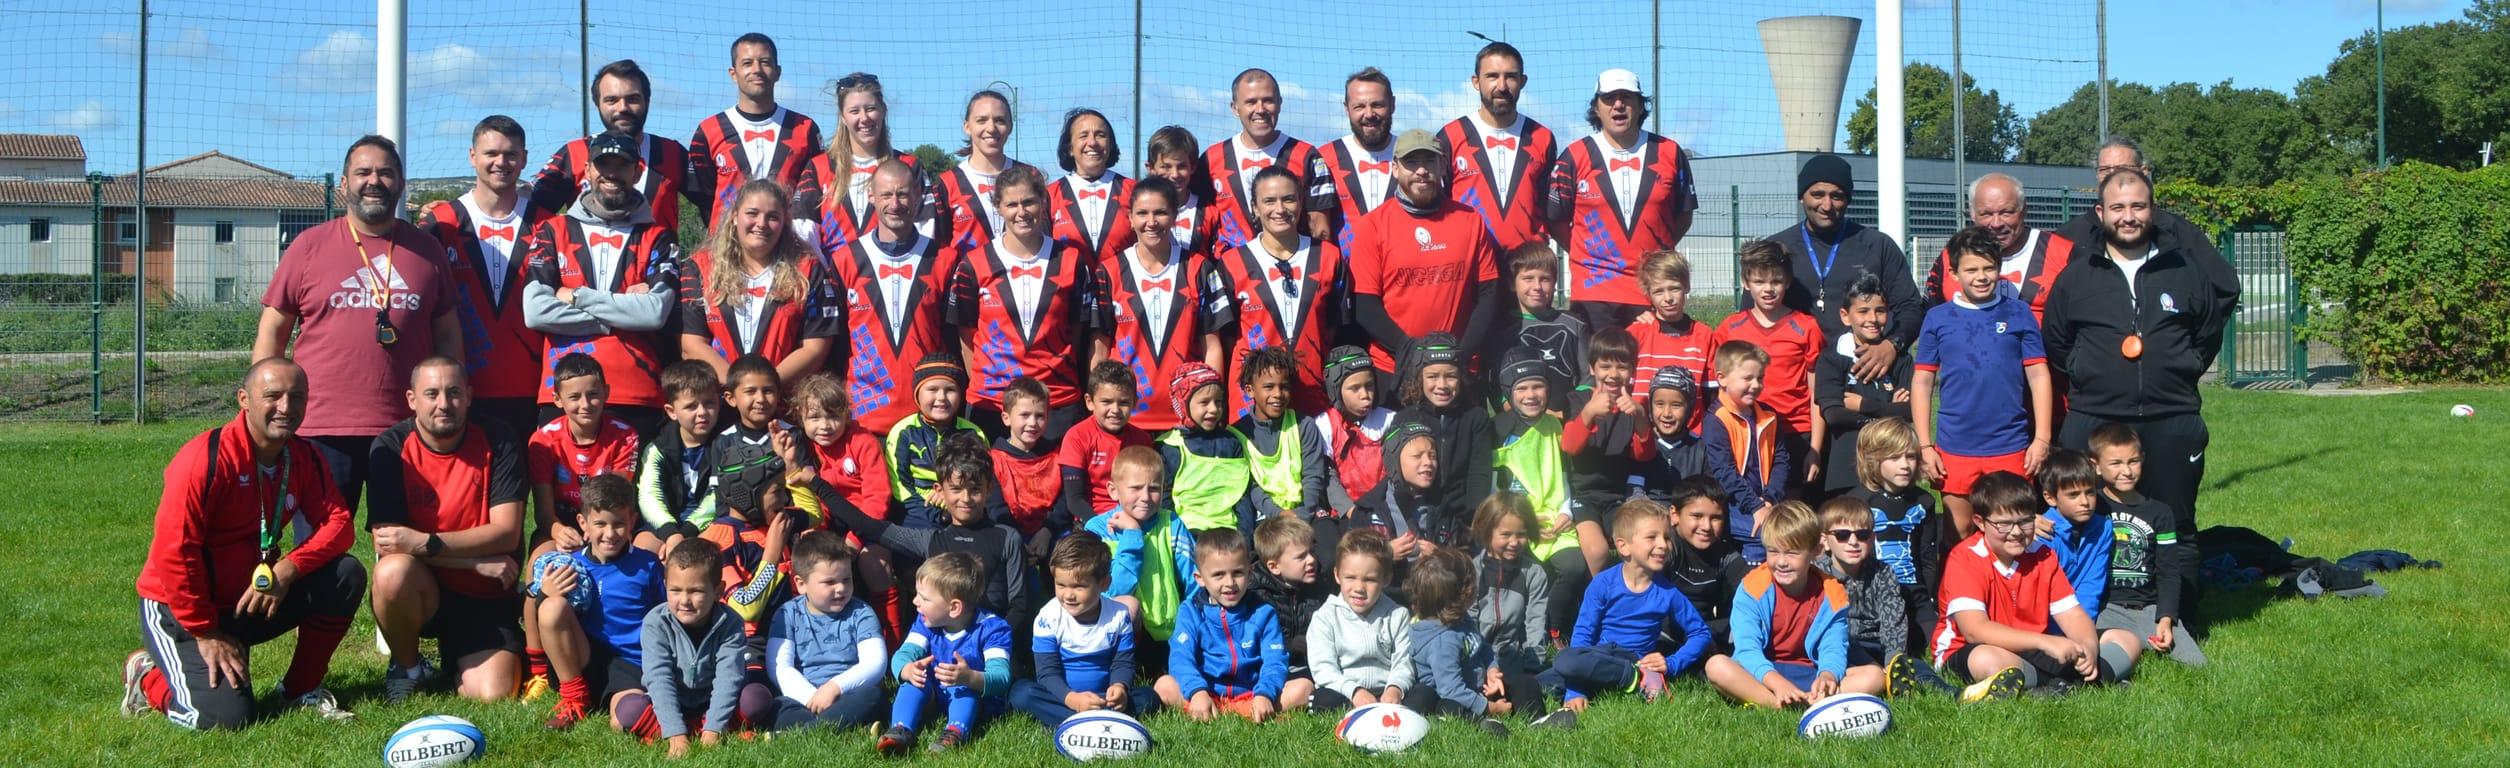 Rugby Club Senas Mallemort